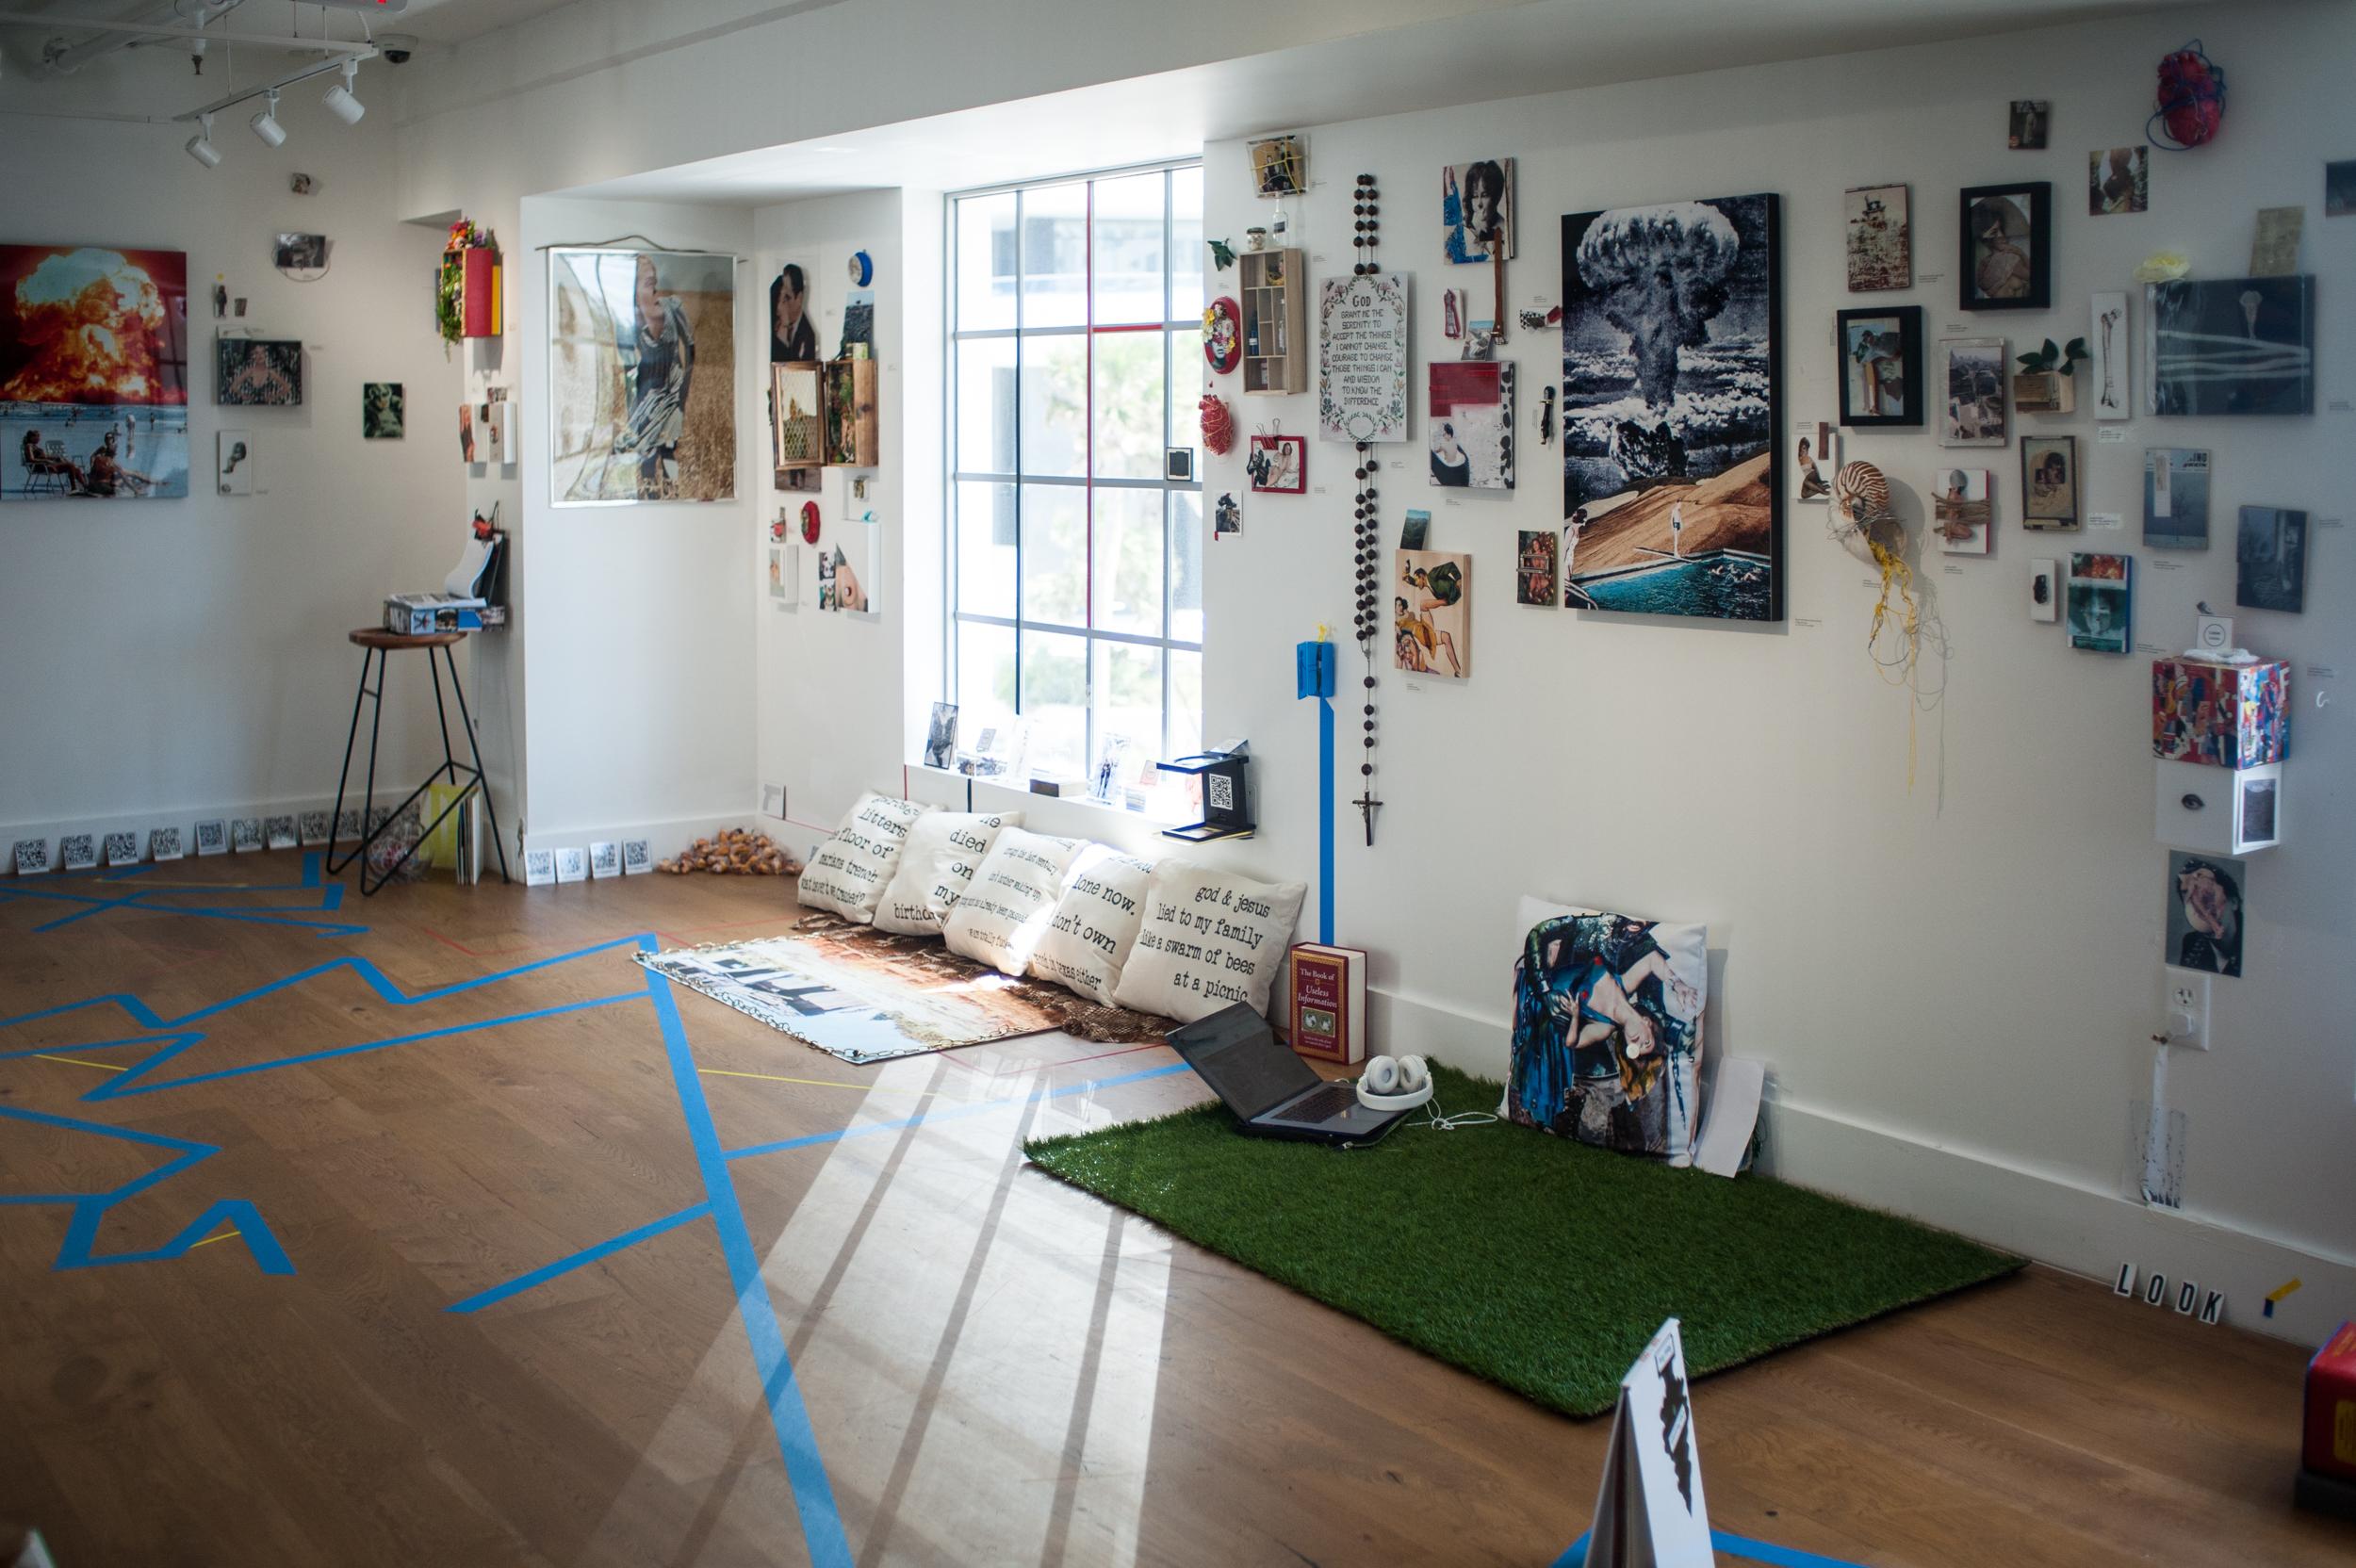 Faena-Exhibition-Images-66.jpg